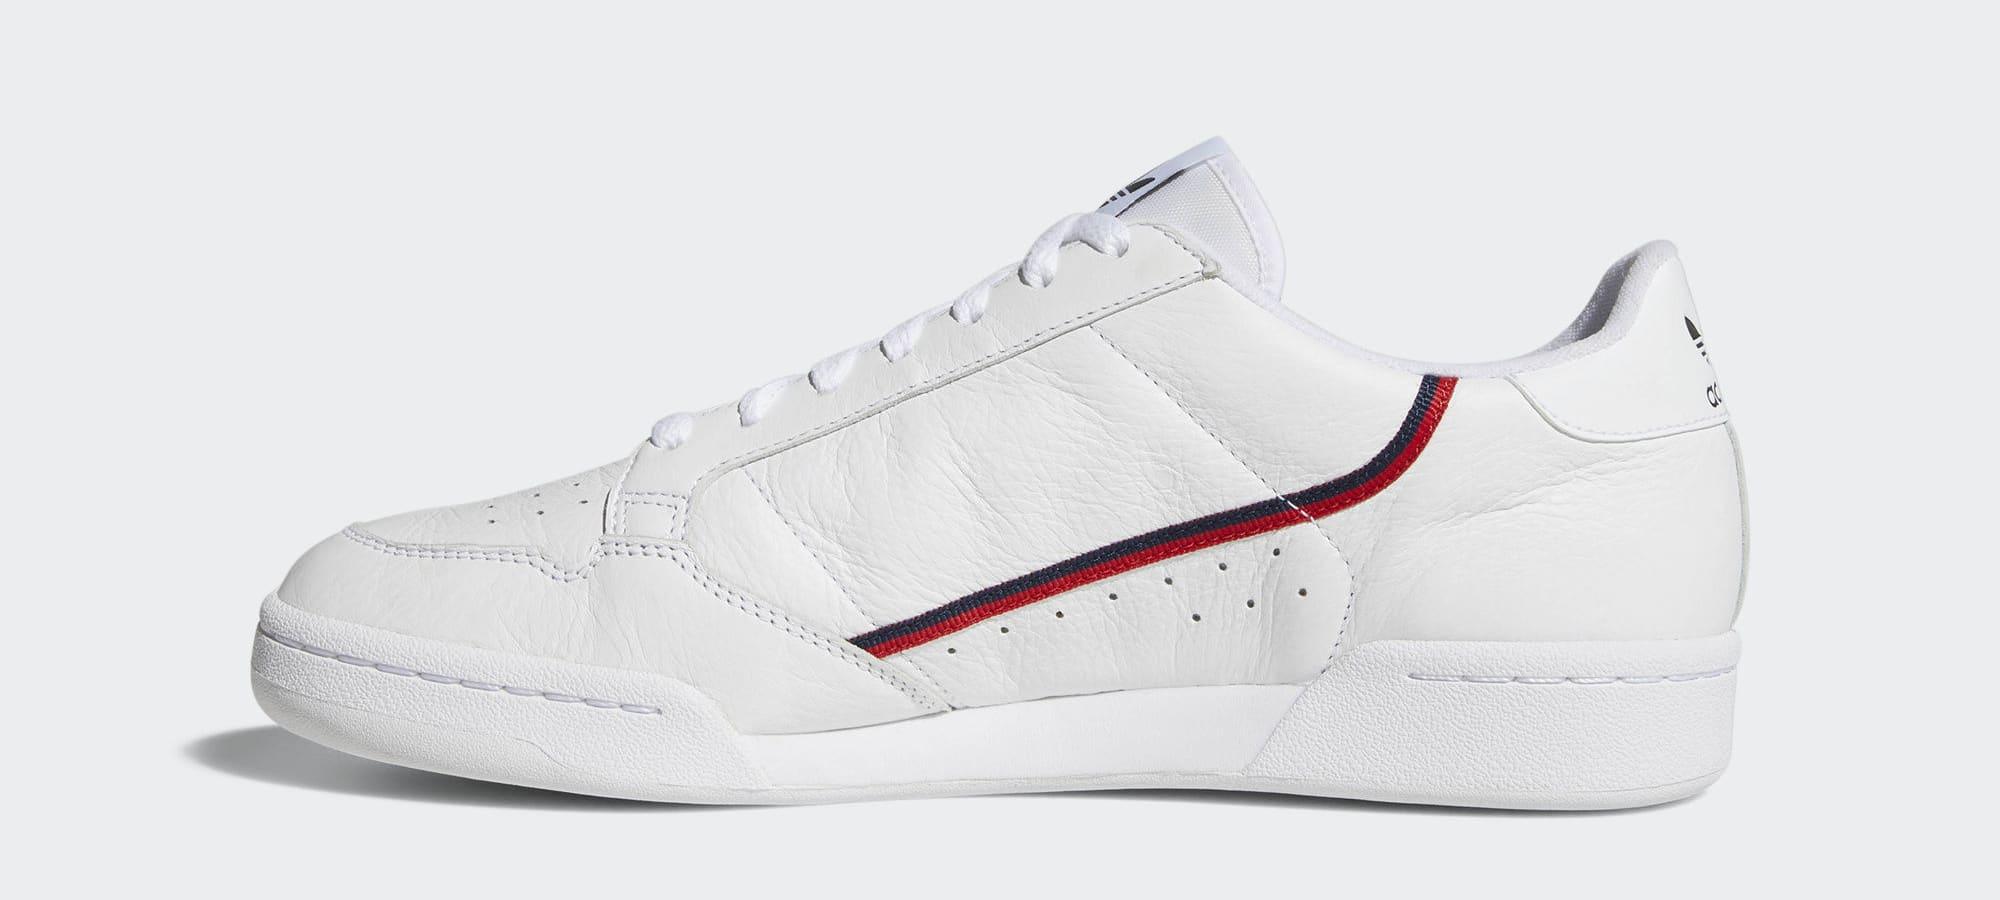 Adidas Continental 80 Rascal B41674 (Medial)